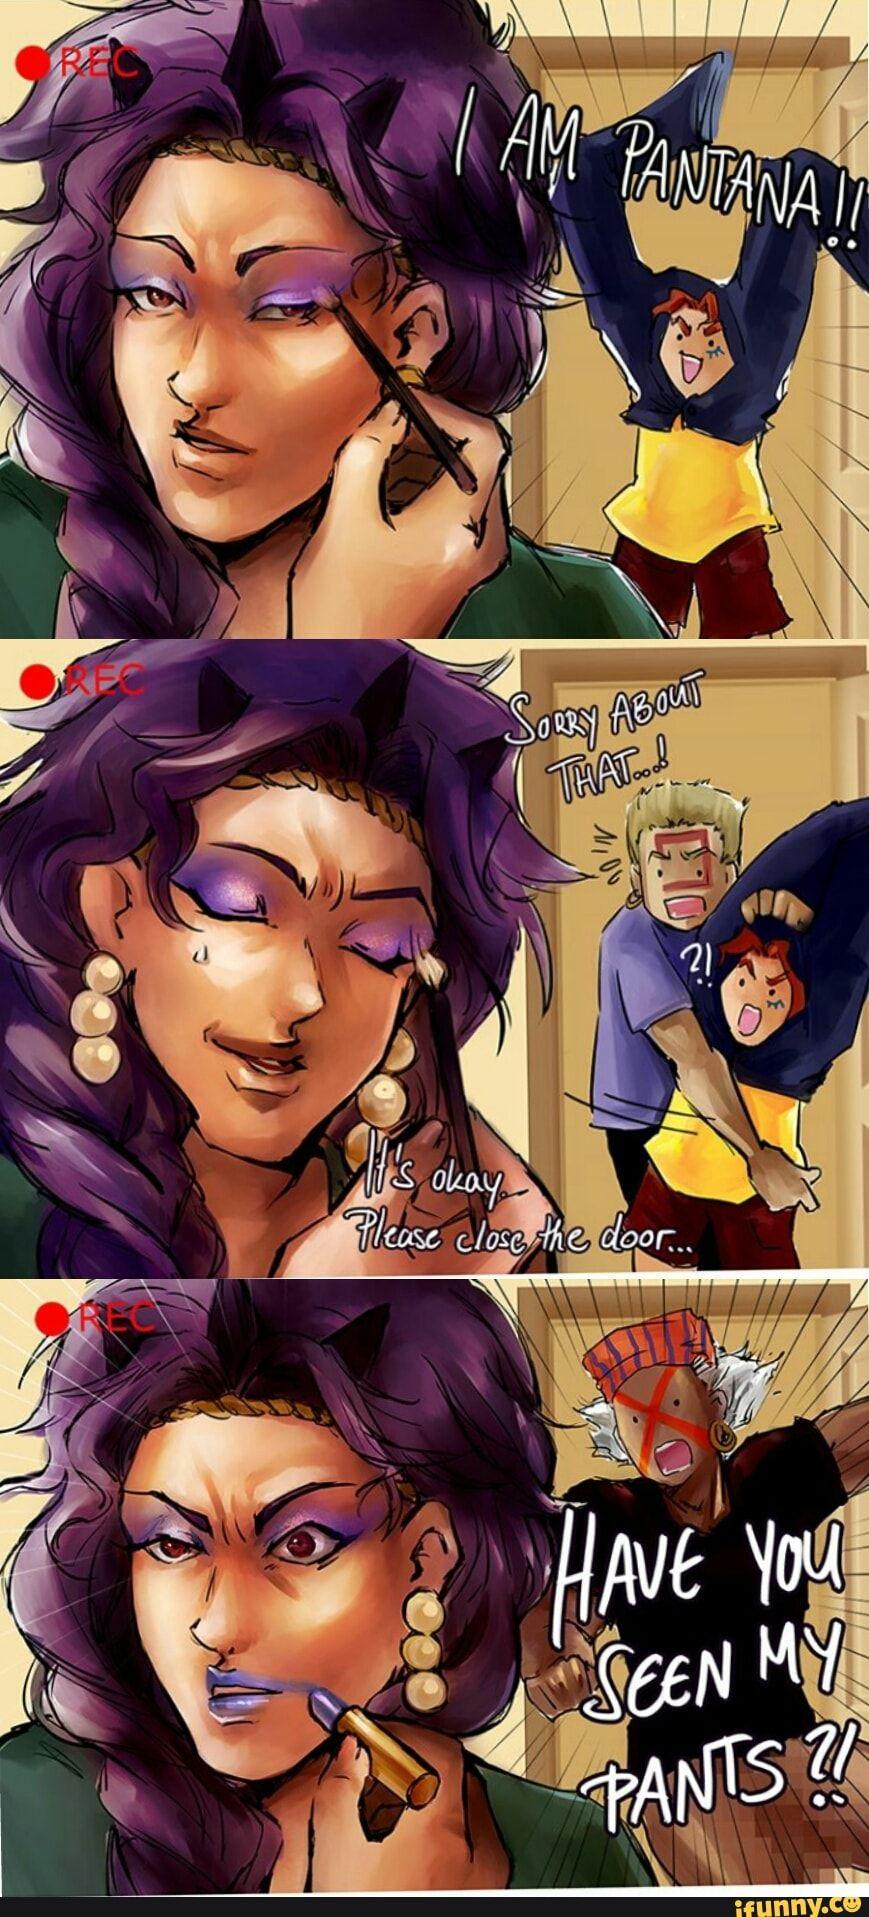 Kars is best dad  (A short gag comic featuring the Pillar Men from